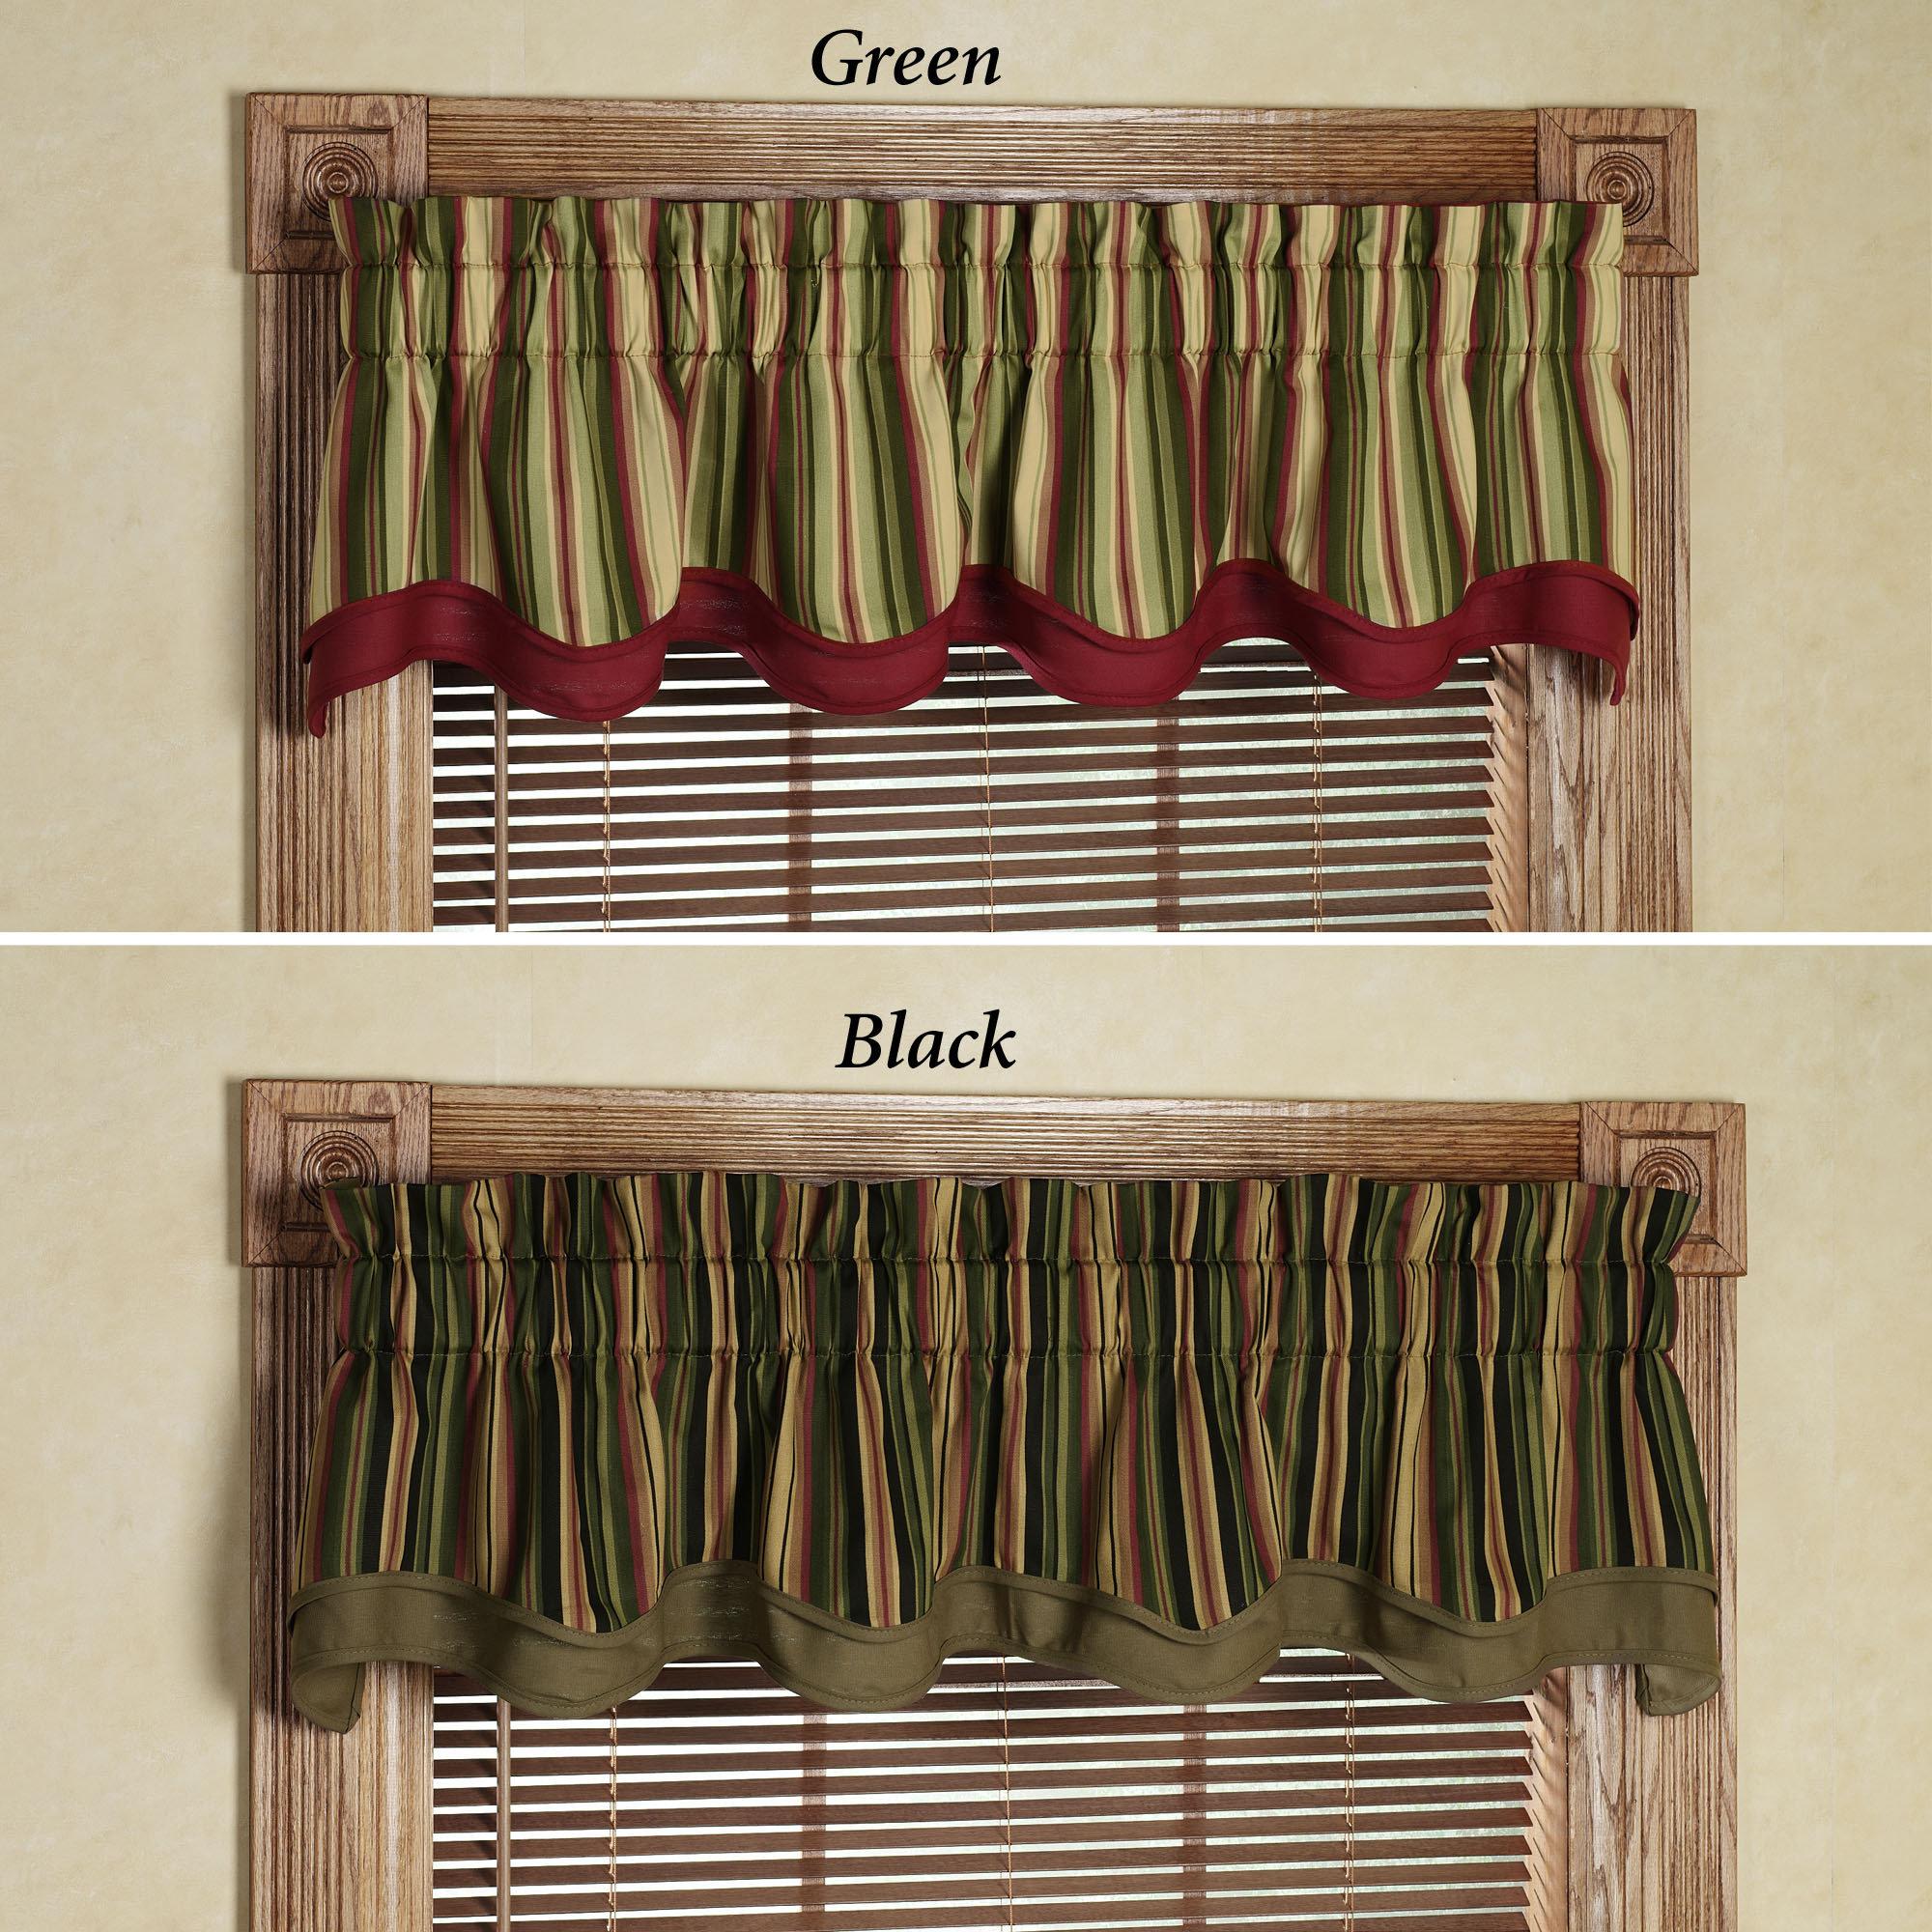 Country style kitchen curtains - Cotton Kitchen Curtains Ideas Download Country Style